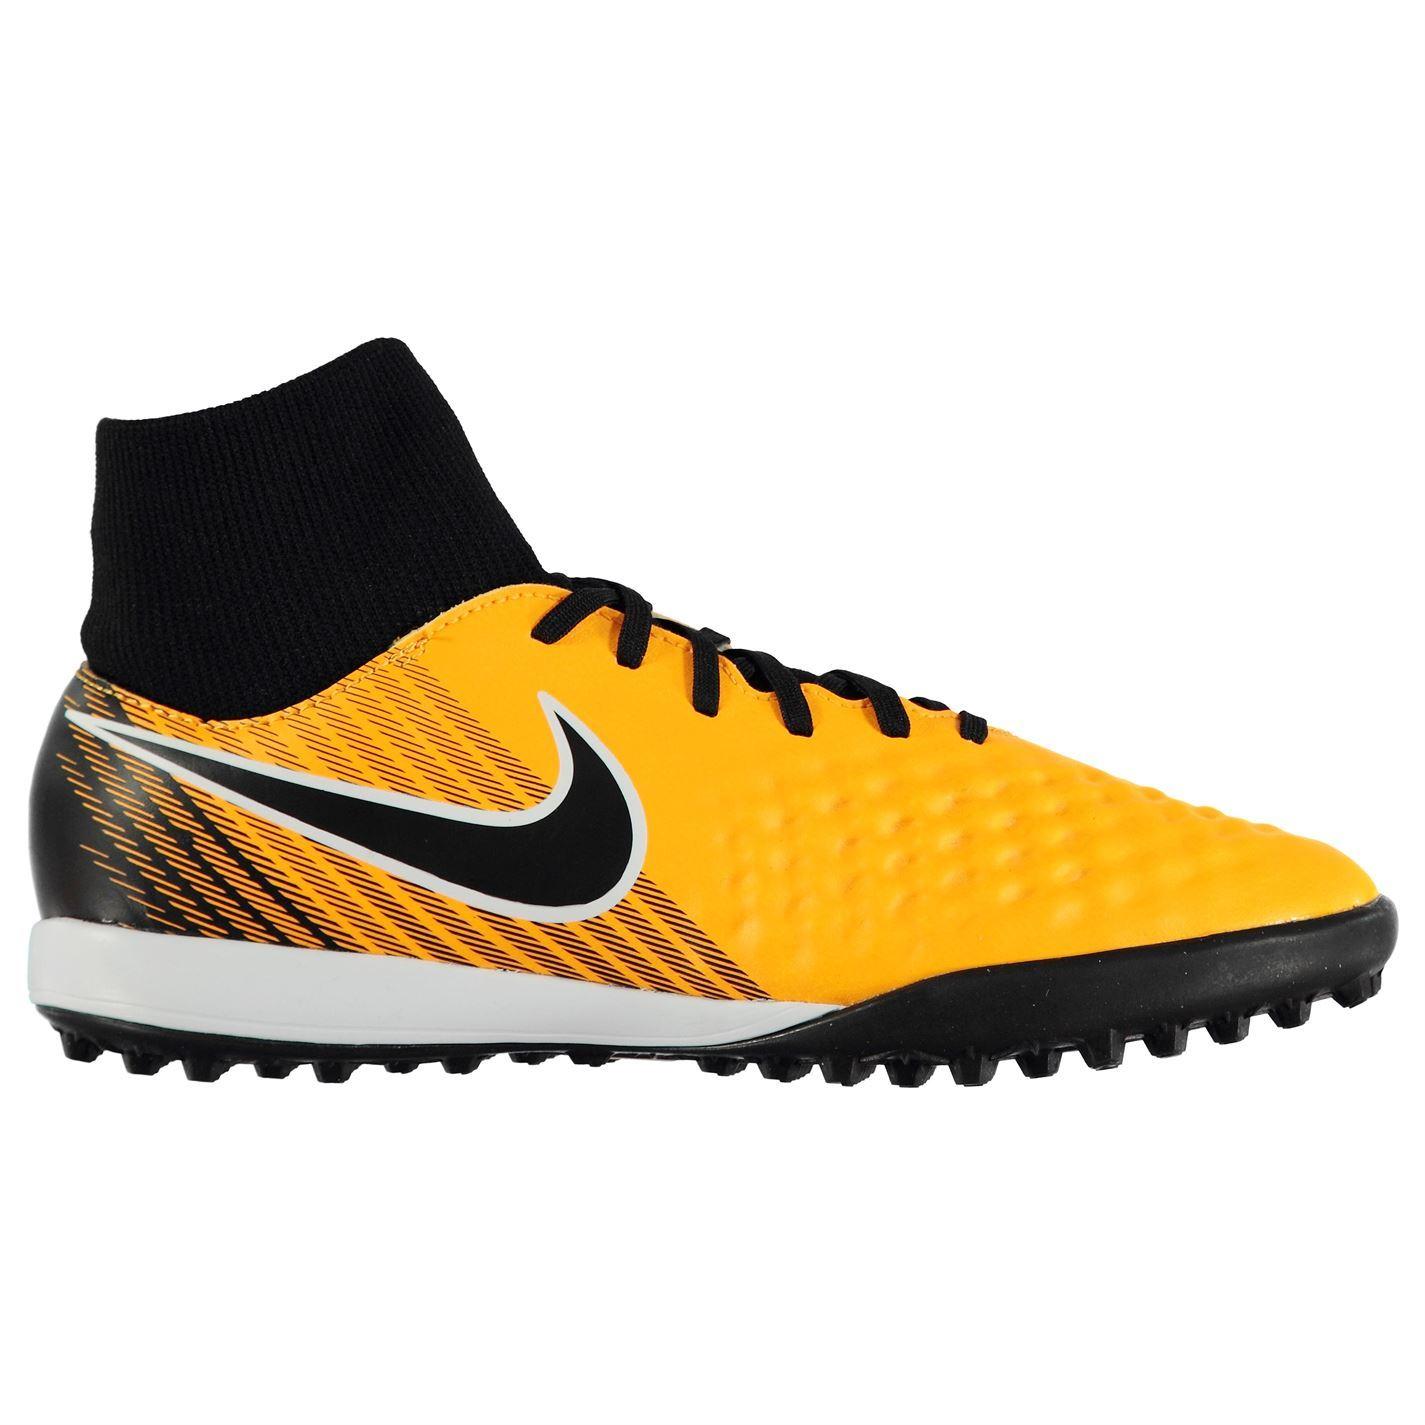 8f65cfb4d14c ... Nike Magista Onda DF Astro Turf Football Trainers Mens Orange Black  Soccer Shoes ...